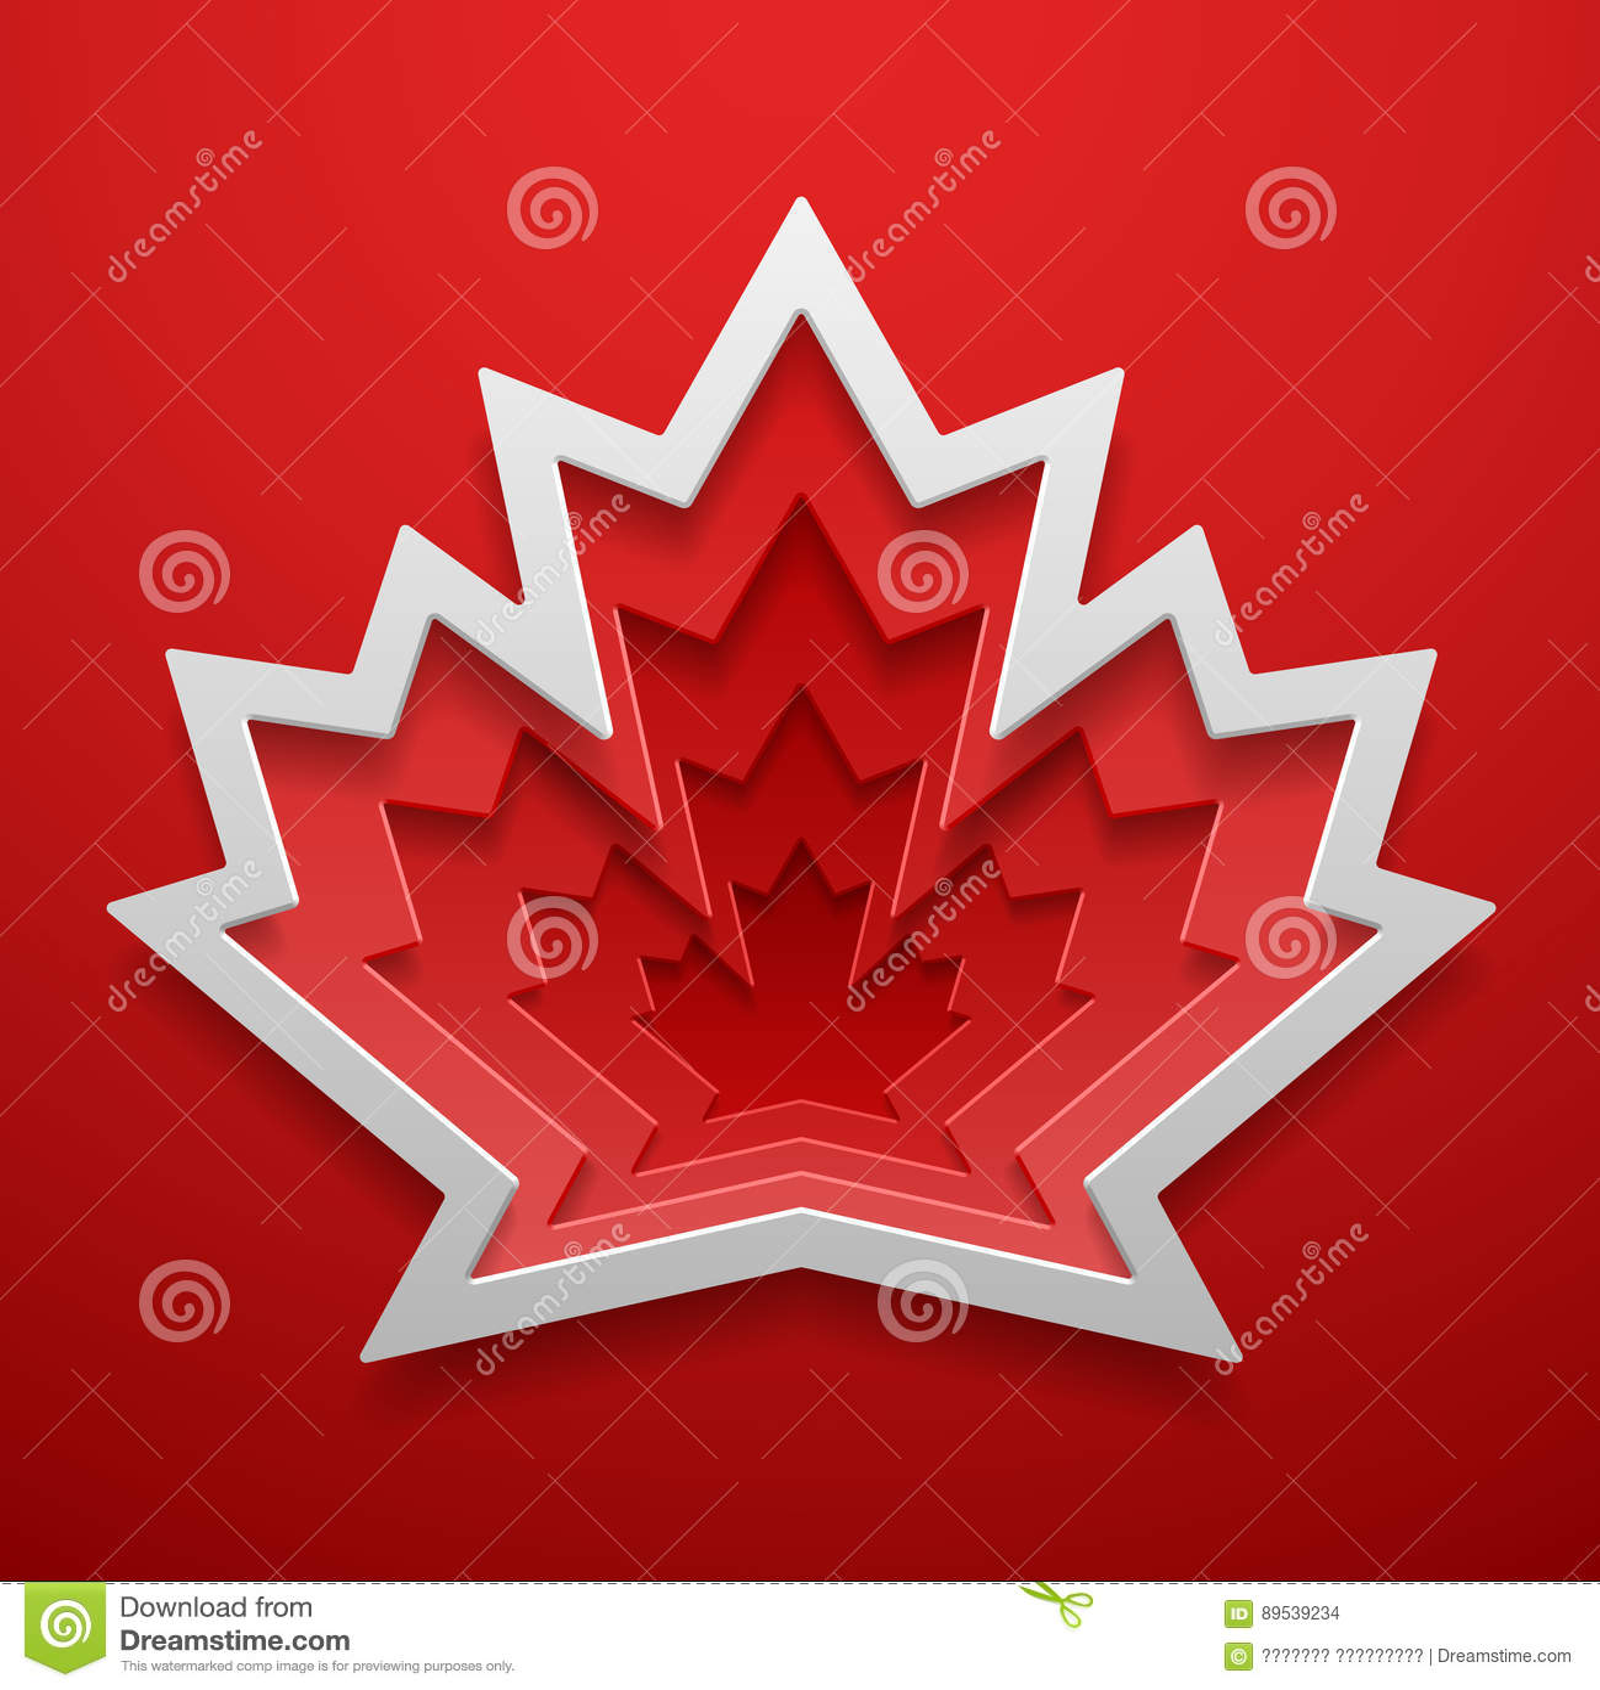 Paper Art Of Maple Leaf Shape Canadian Symbol Decoration Template